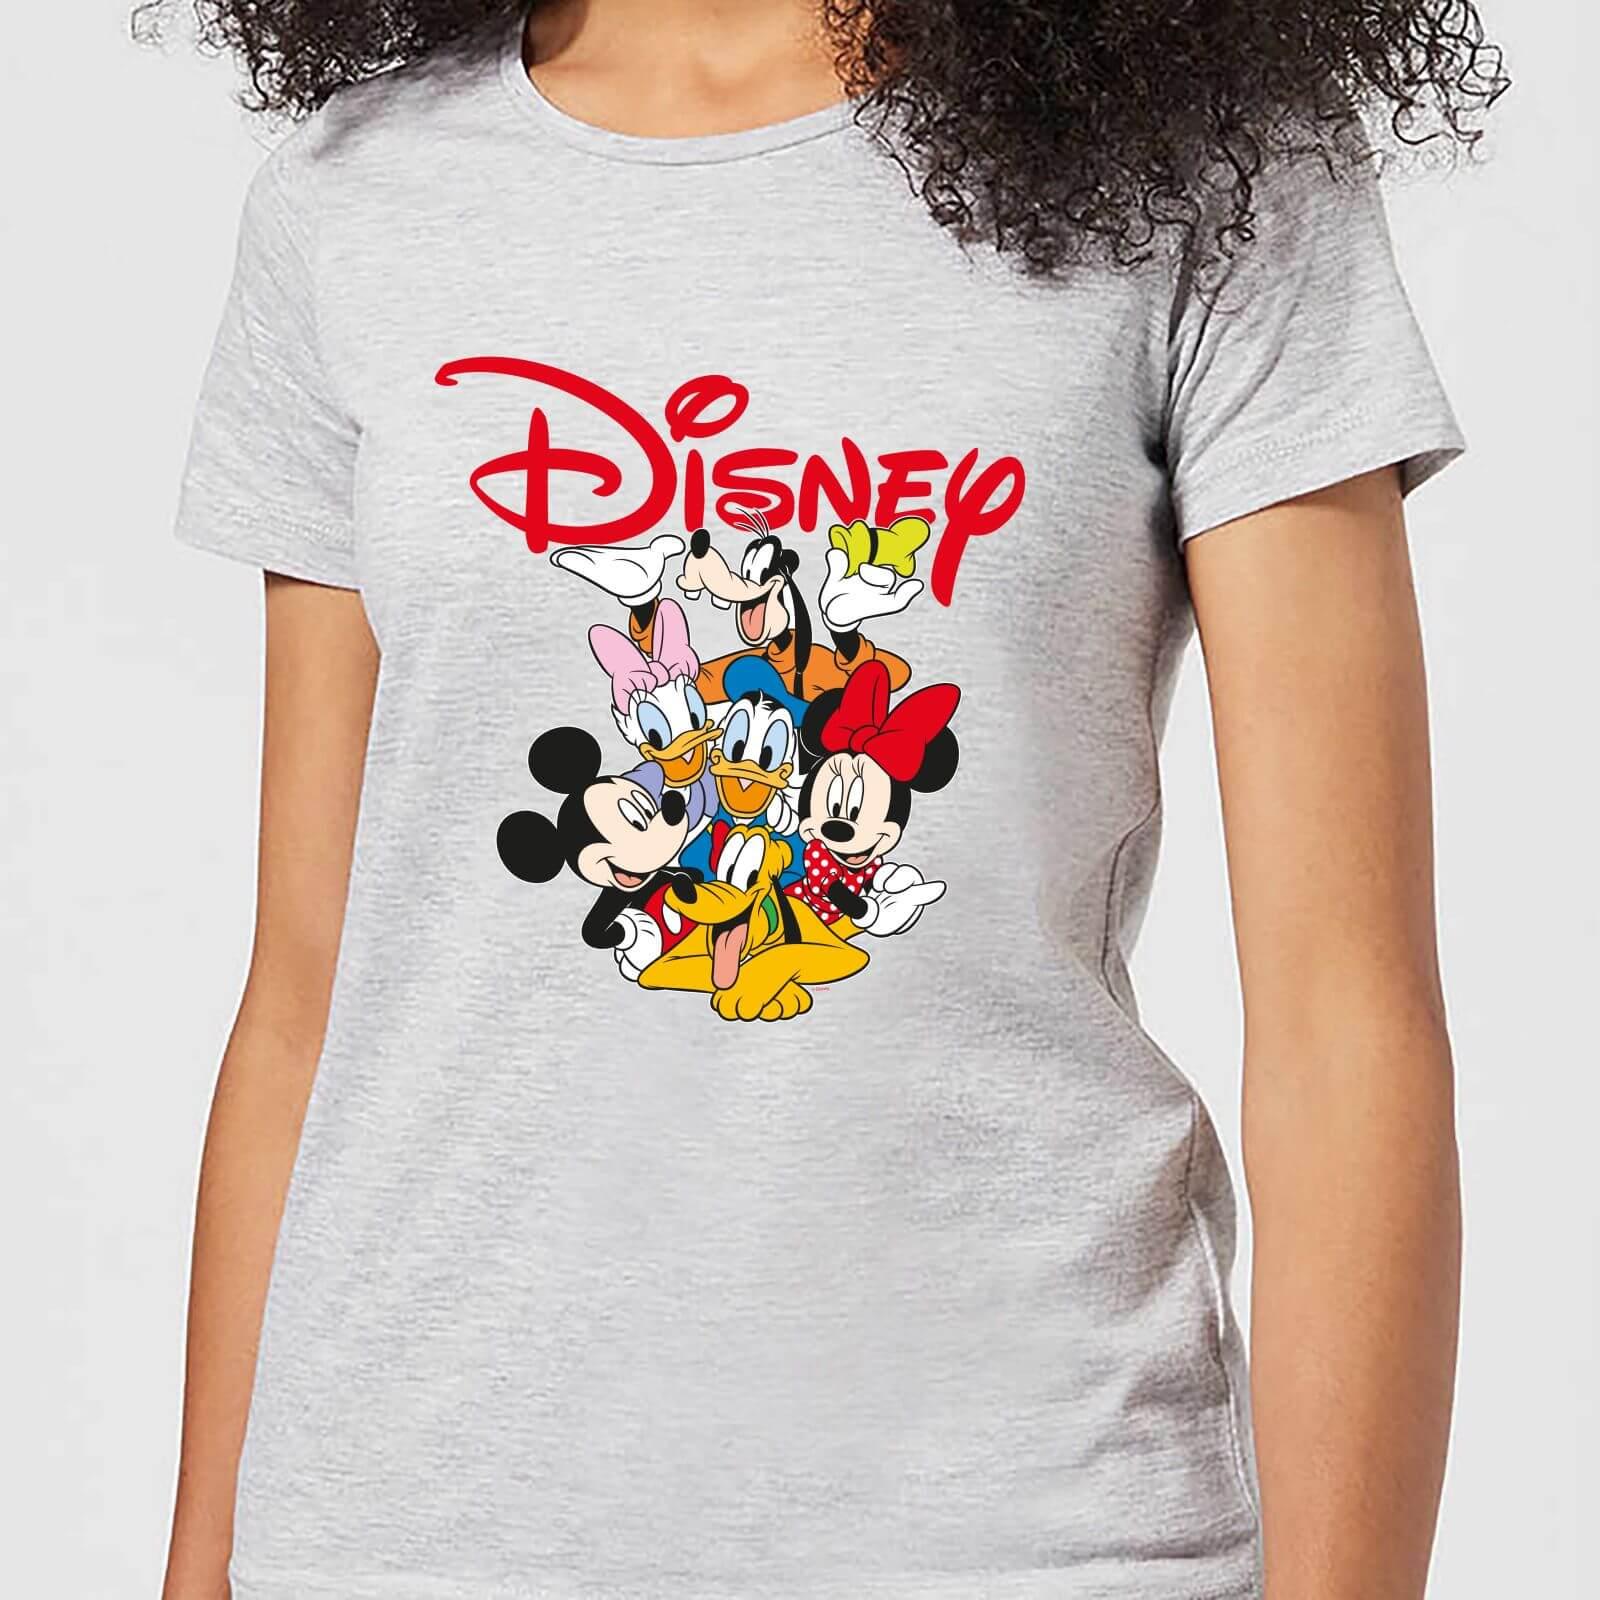 Disney Mickey Mouse Disney Crew Women's T-Shirt - Grey - 3XL - Grey